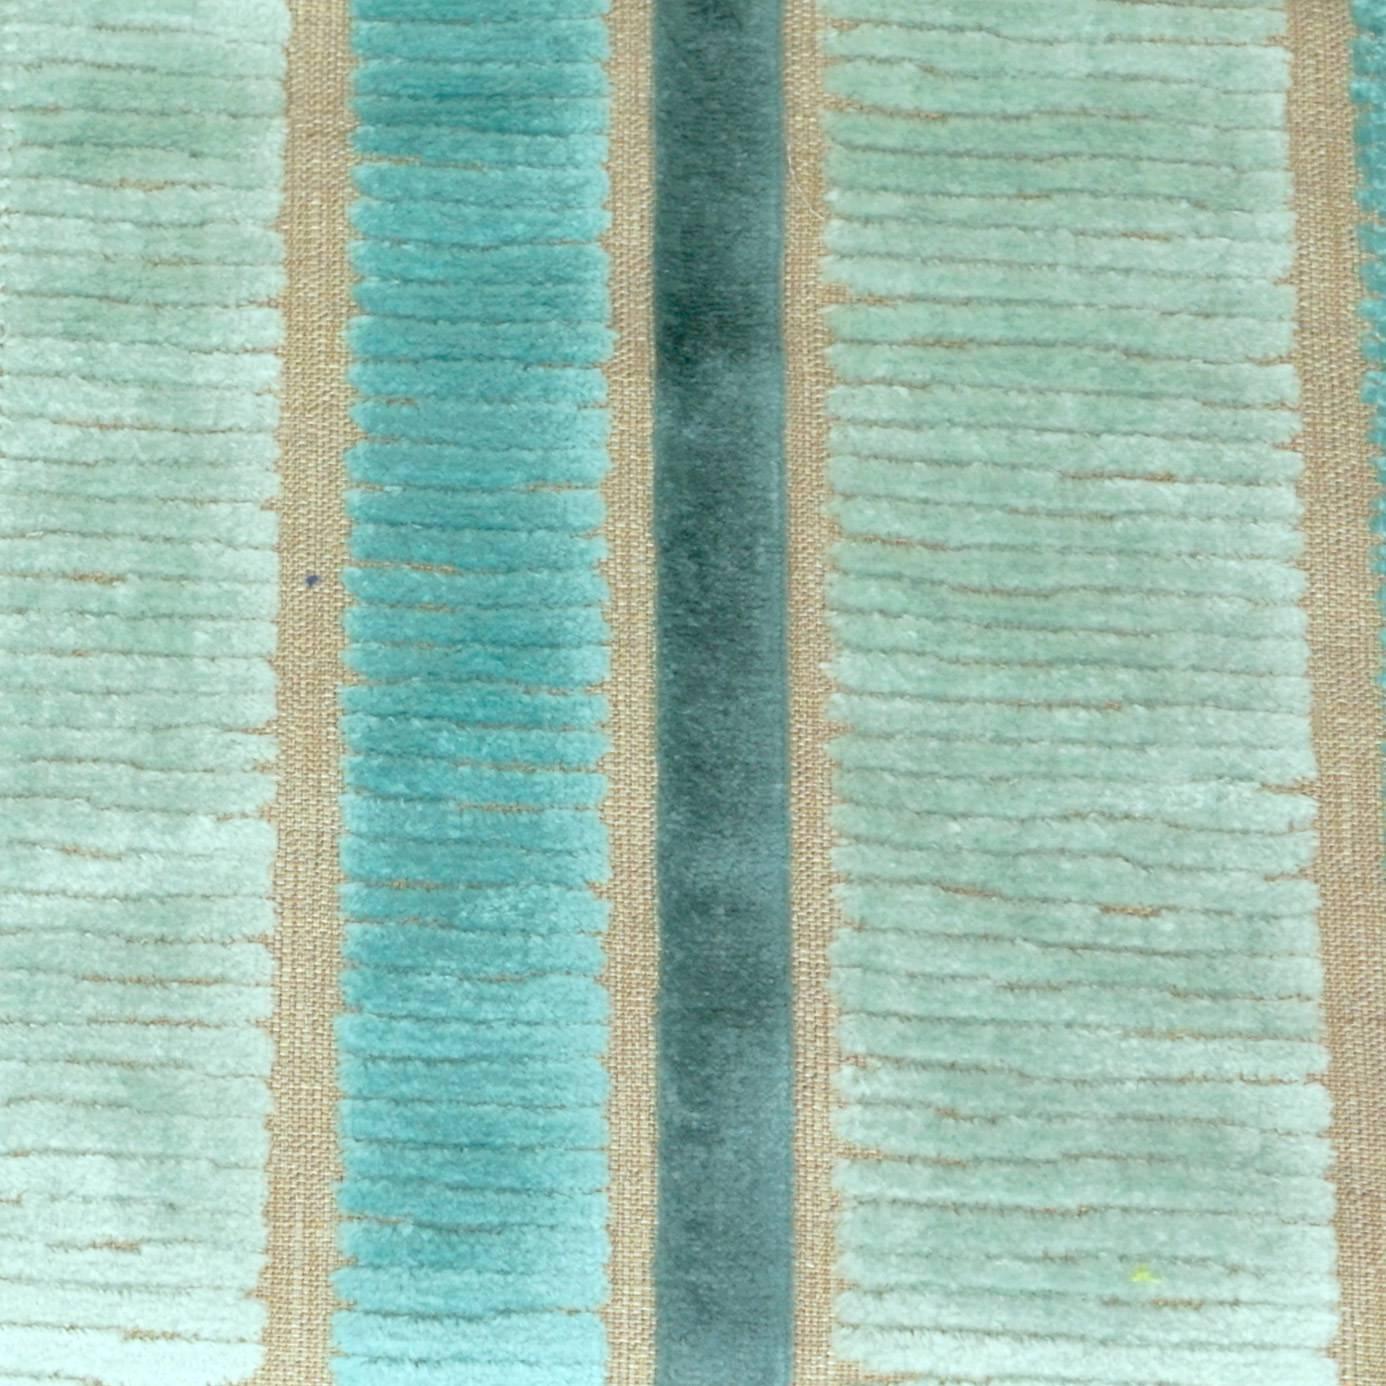 Piomba Fabric Celadon F2107 03 Designers Guild Savio